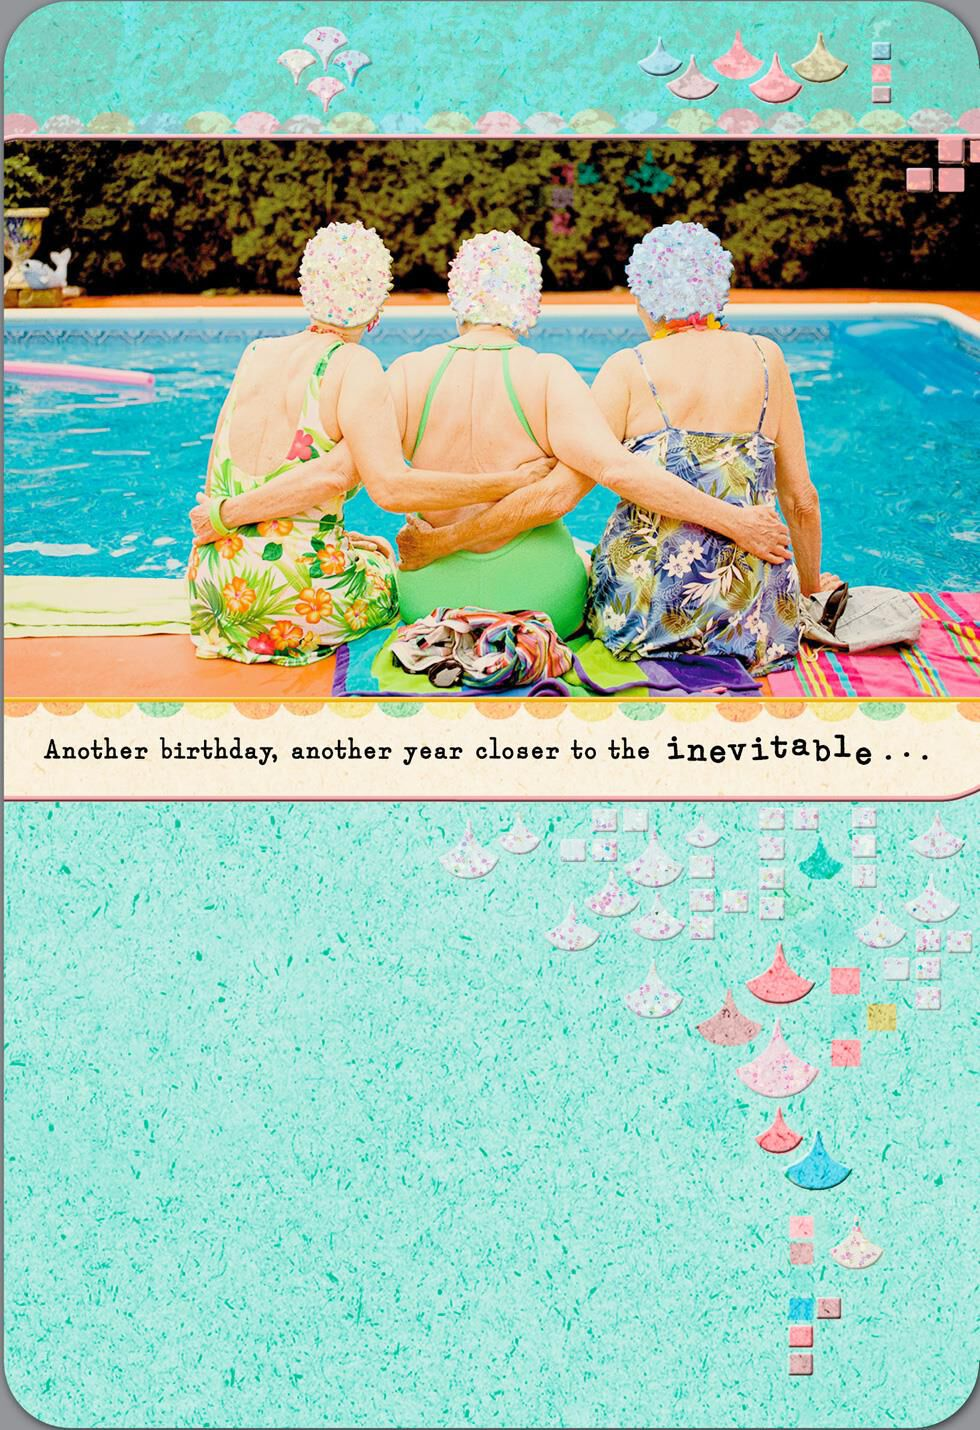 Swim Cap Ladies Funny Birthday Card Greeting Cards